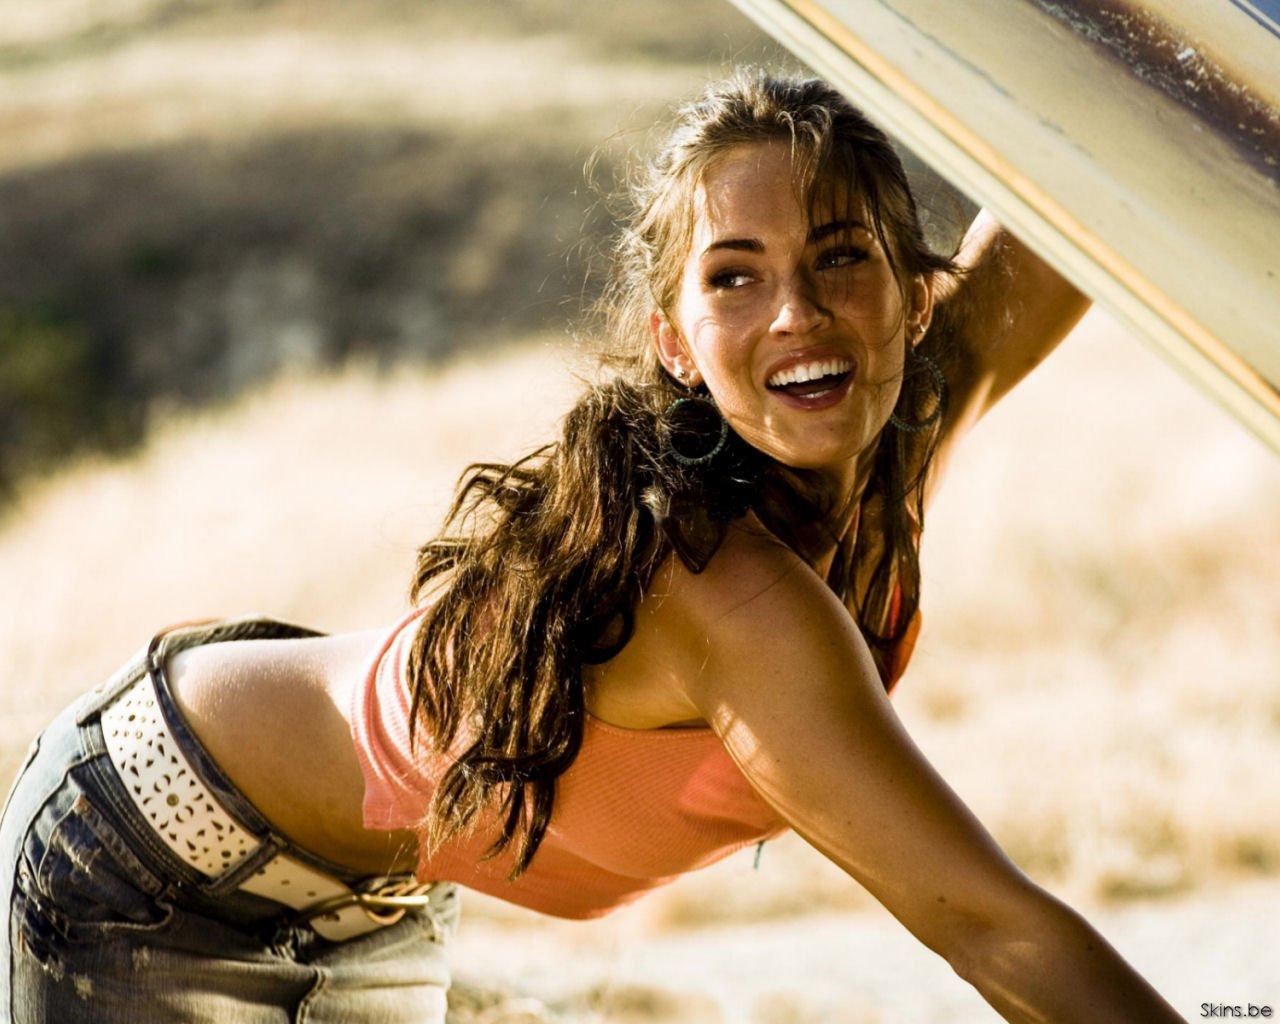 Happy Birthday to Megan Fox!